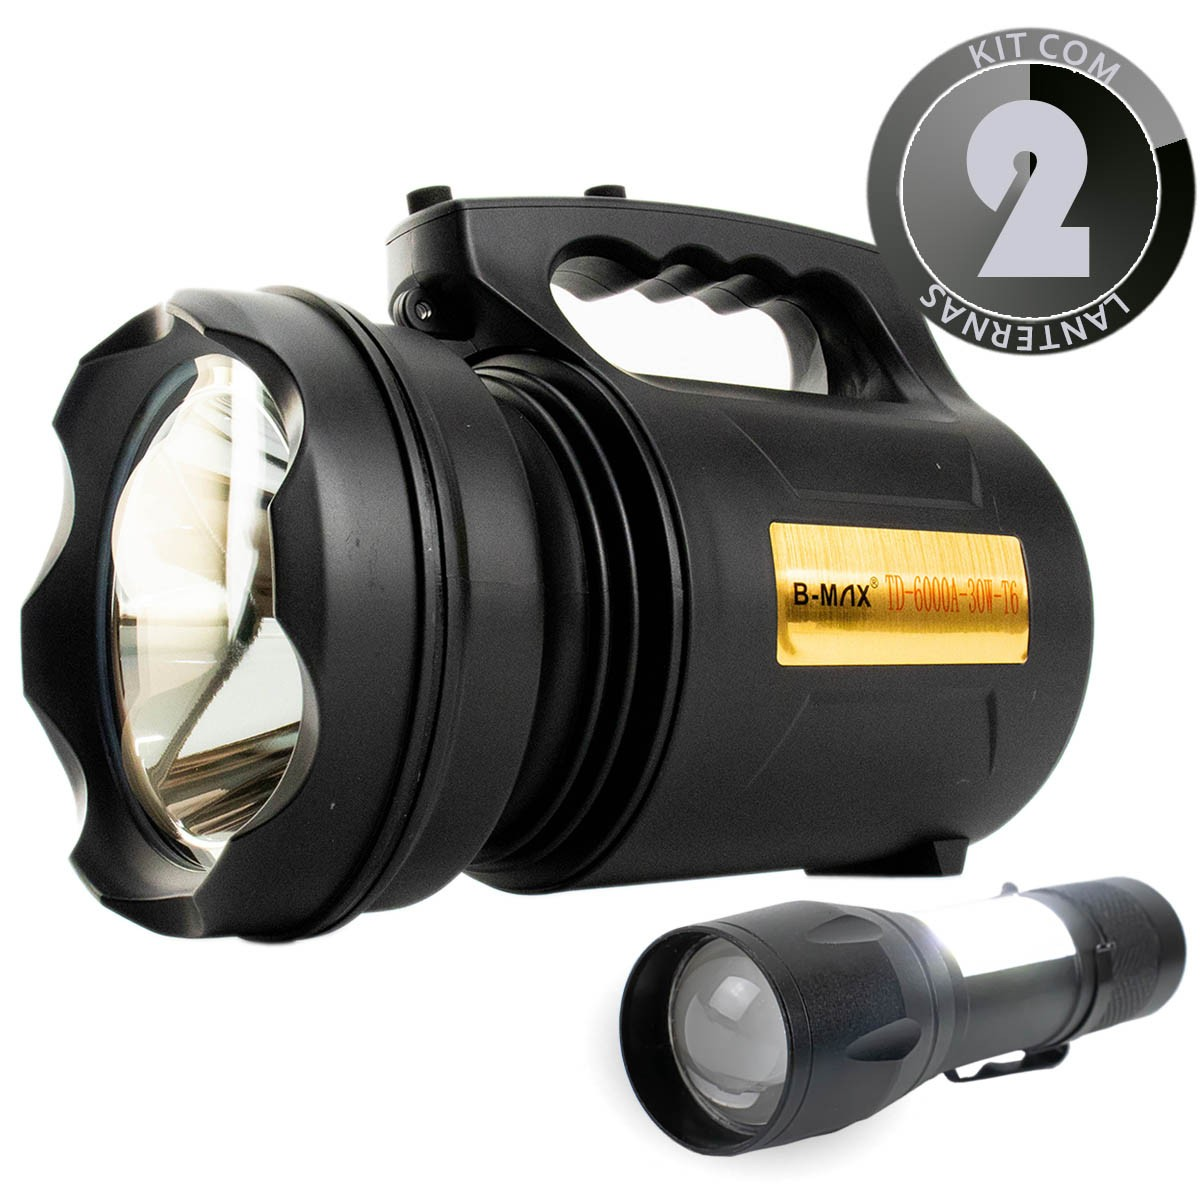 KIT Lanterna Led Holofote Recarregável TD-6000A-30W-T6 + Mini Lanterna Tática Compacta BM8400